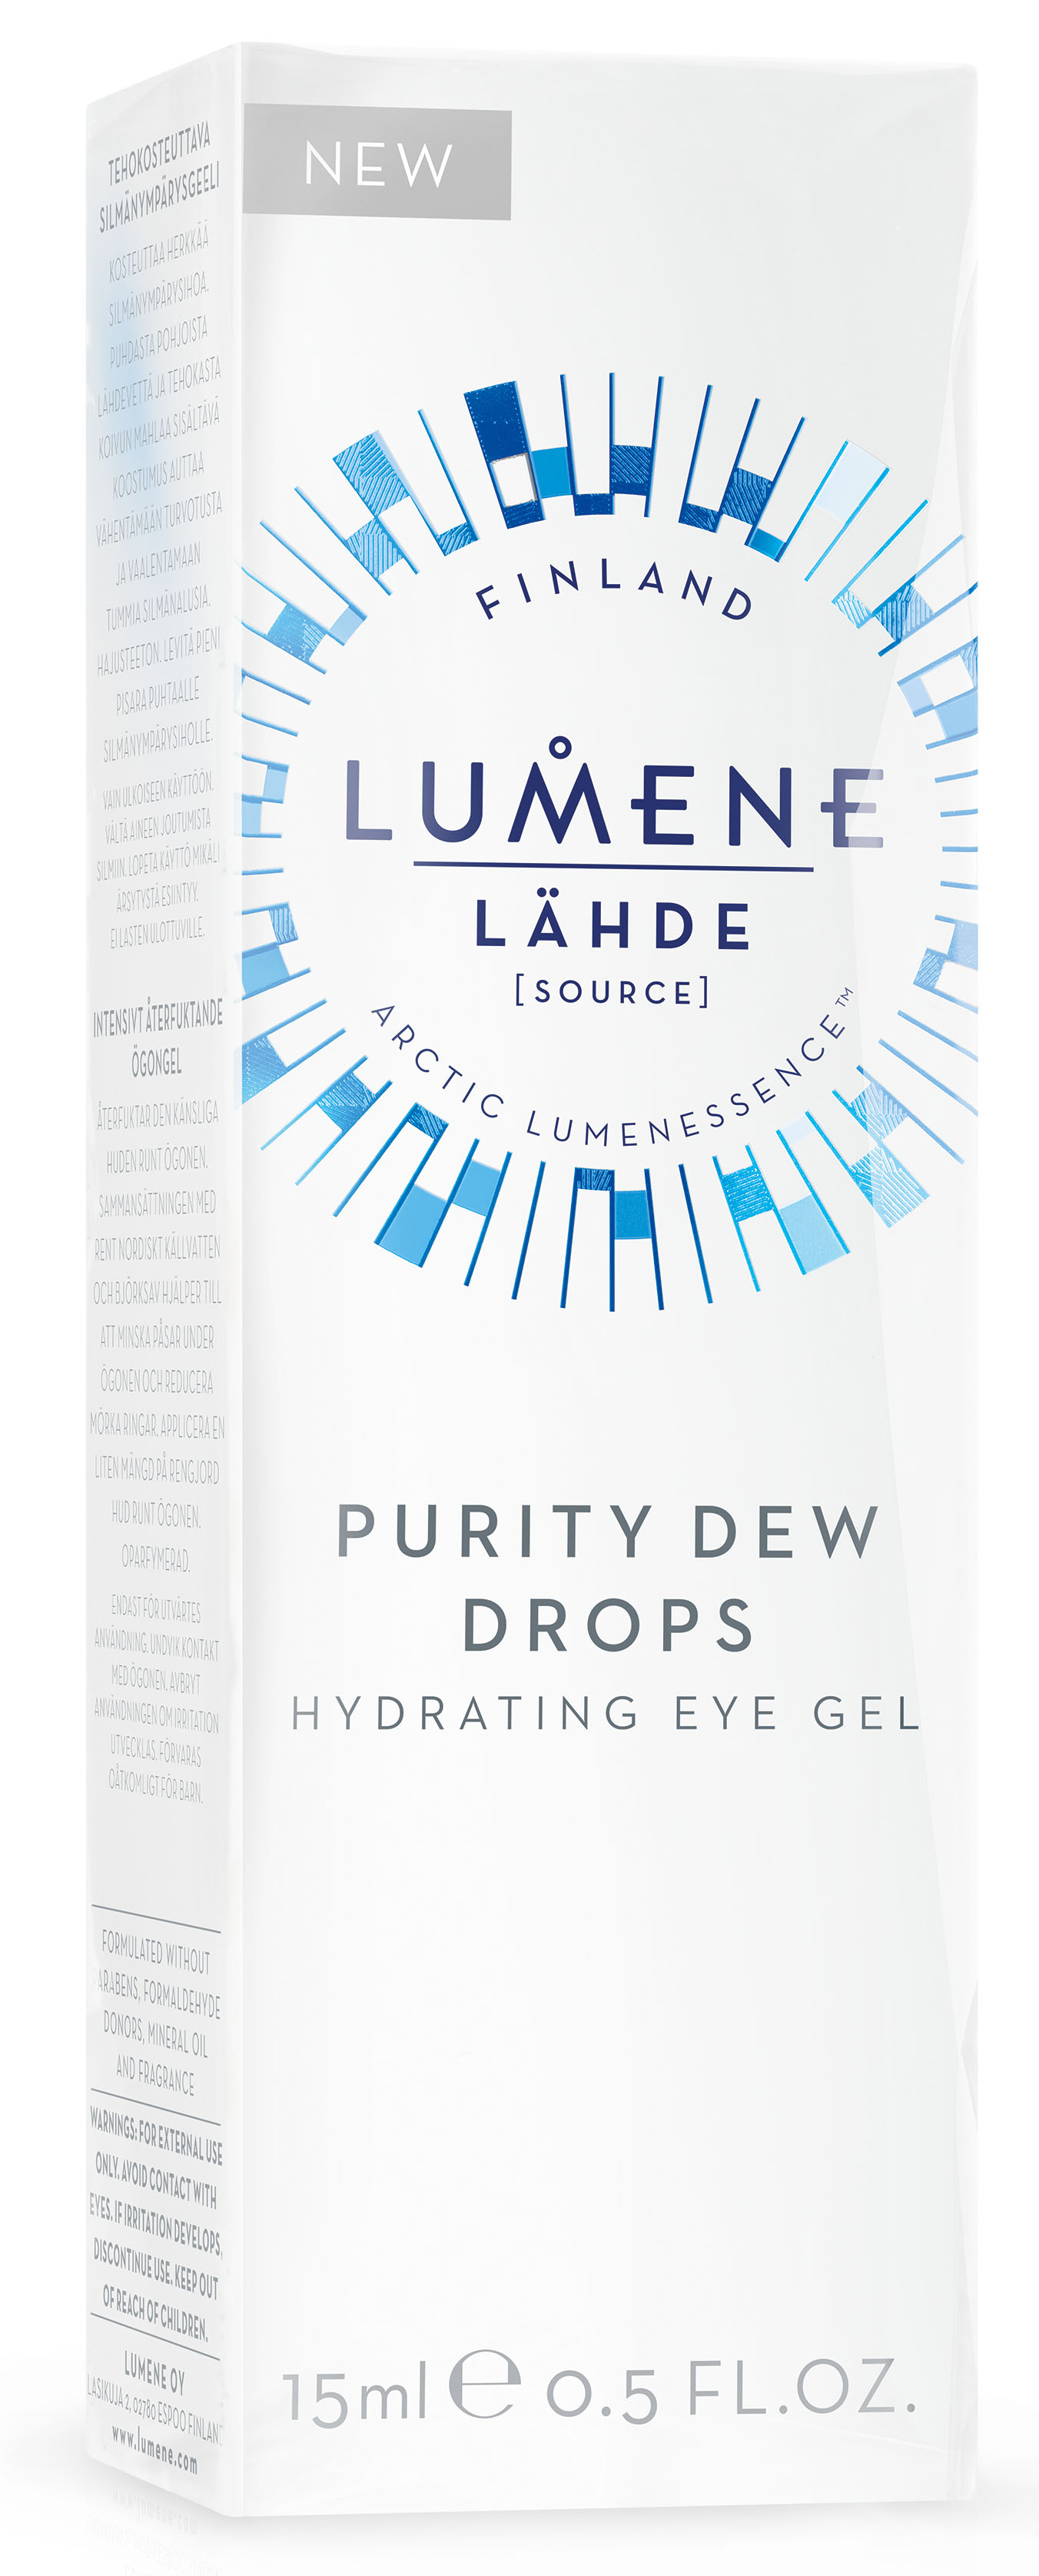 Lumene LahdeУвлажняющий гель для области вокруг глаз, 15 мл LUMENE